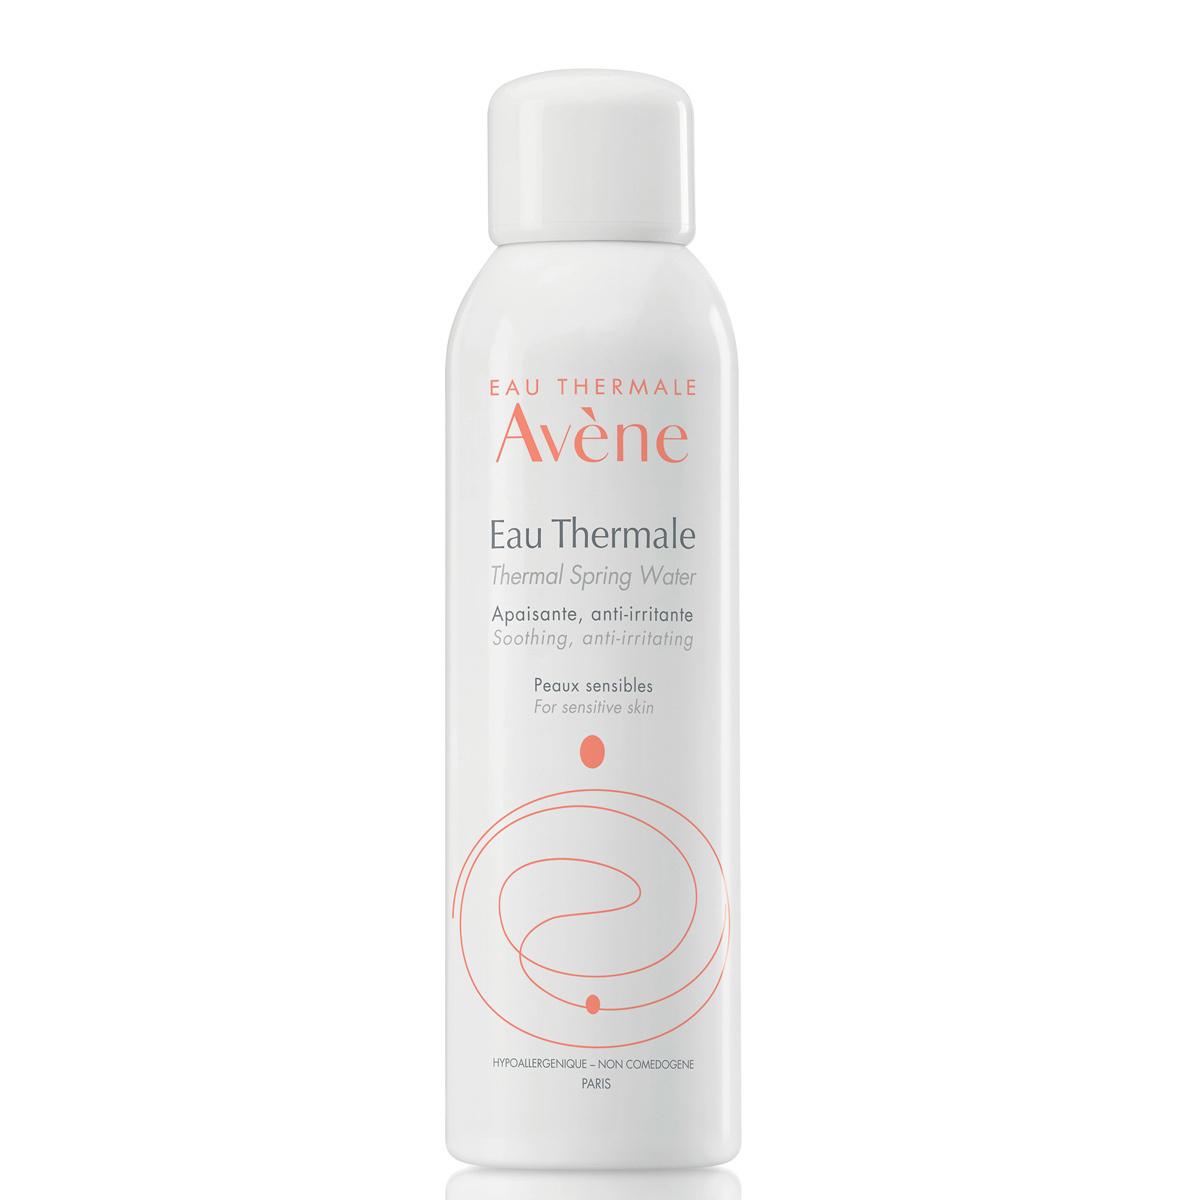 Agua termal de Avène.